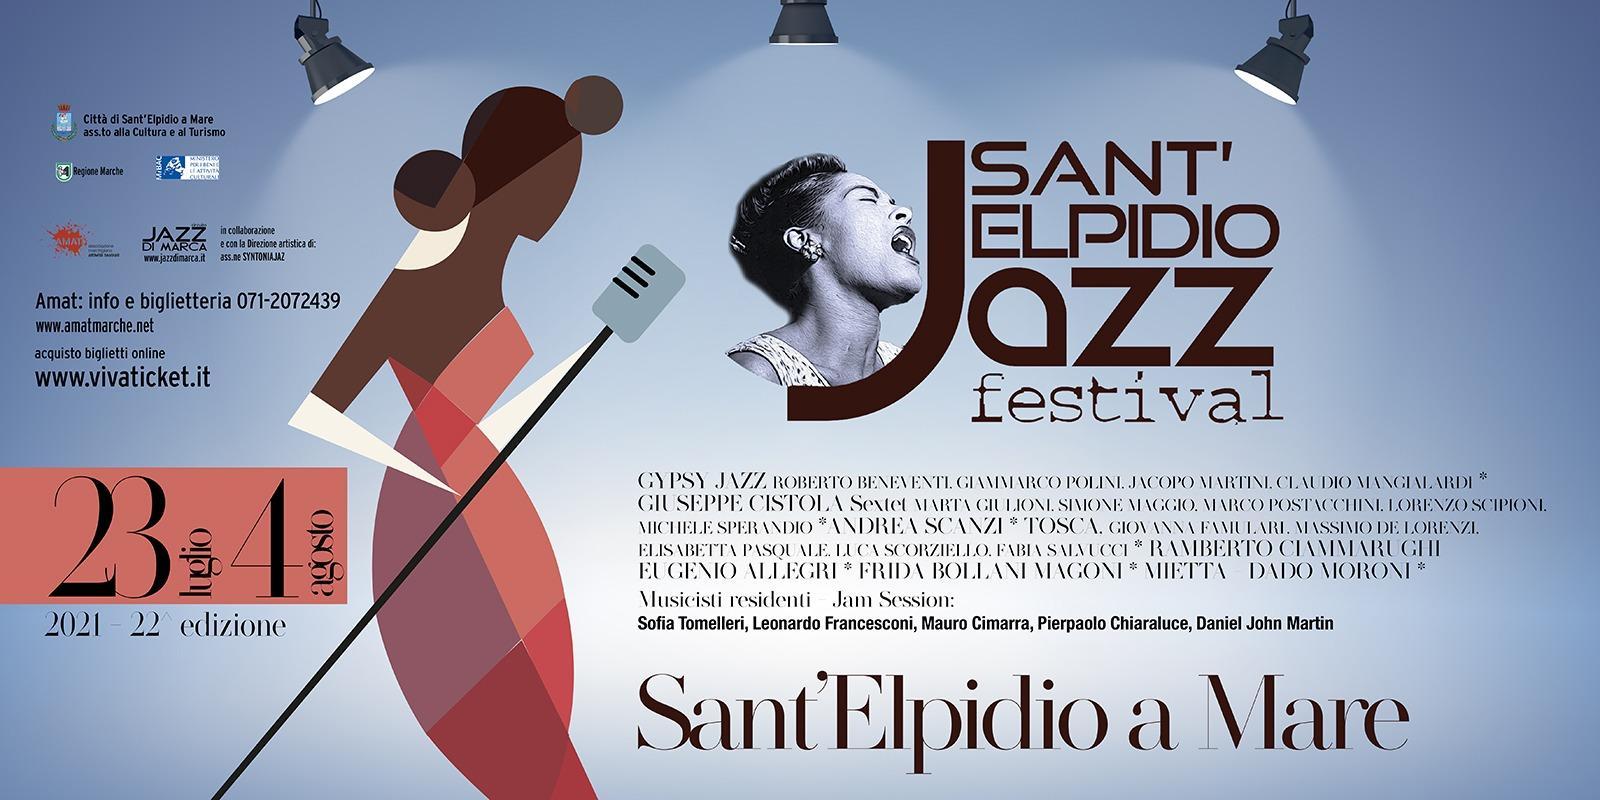 Sant'Elpidio a Mare Jazz Festival – XXII edizione